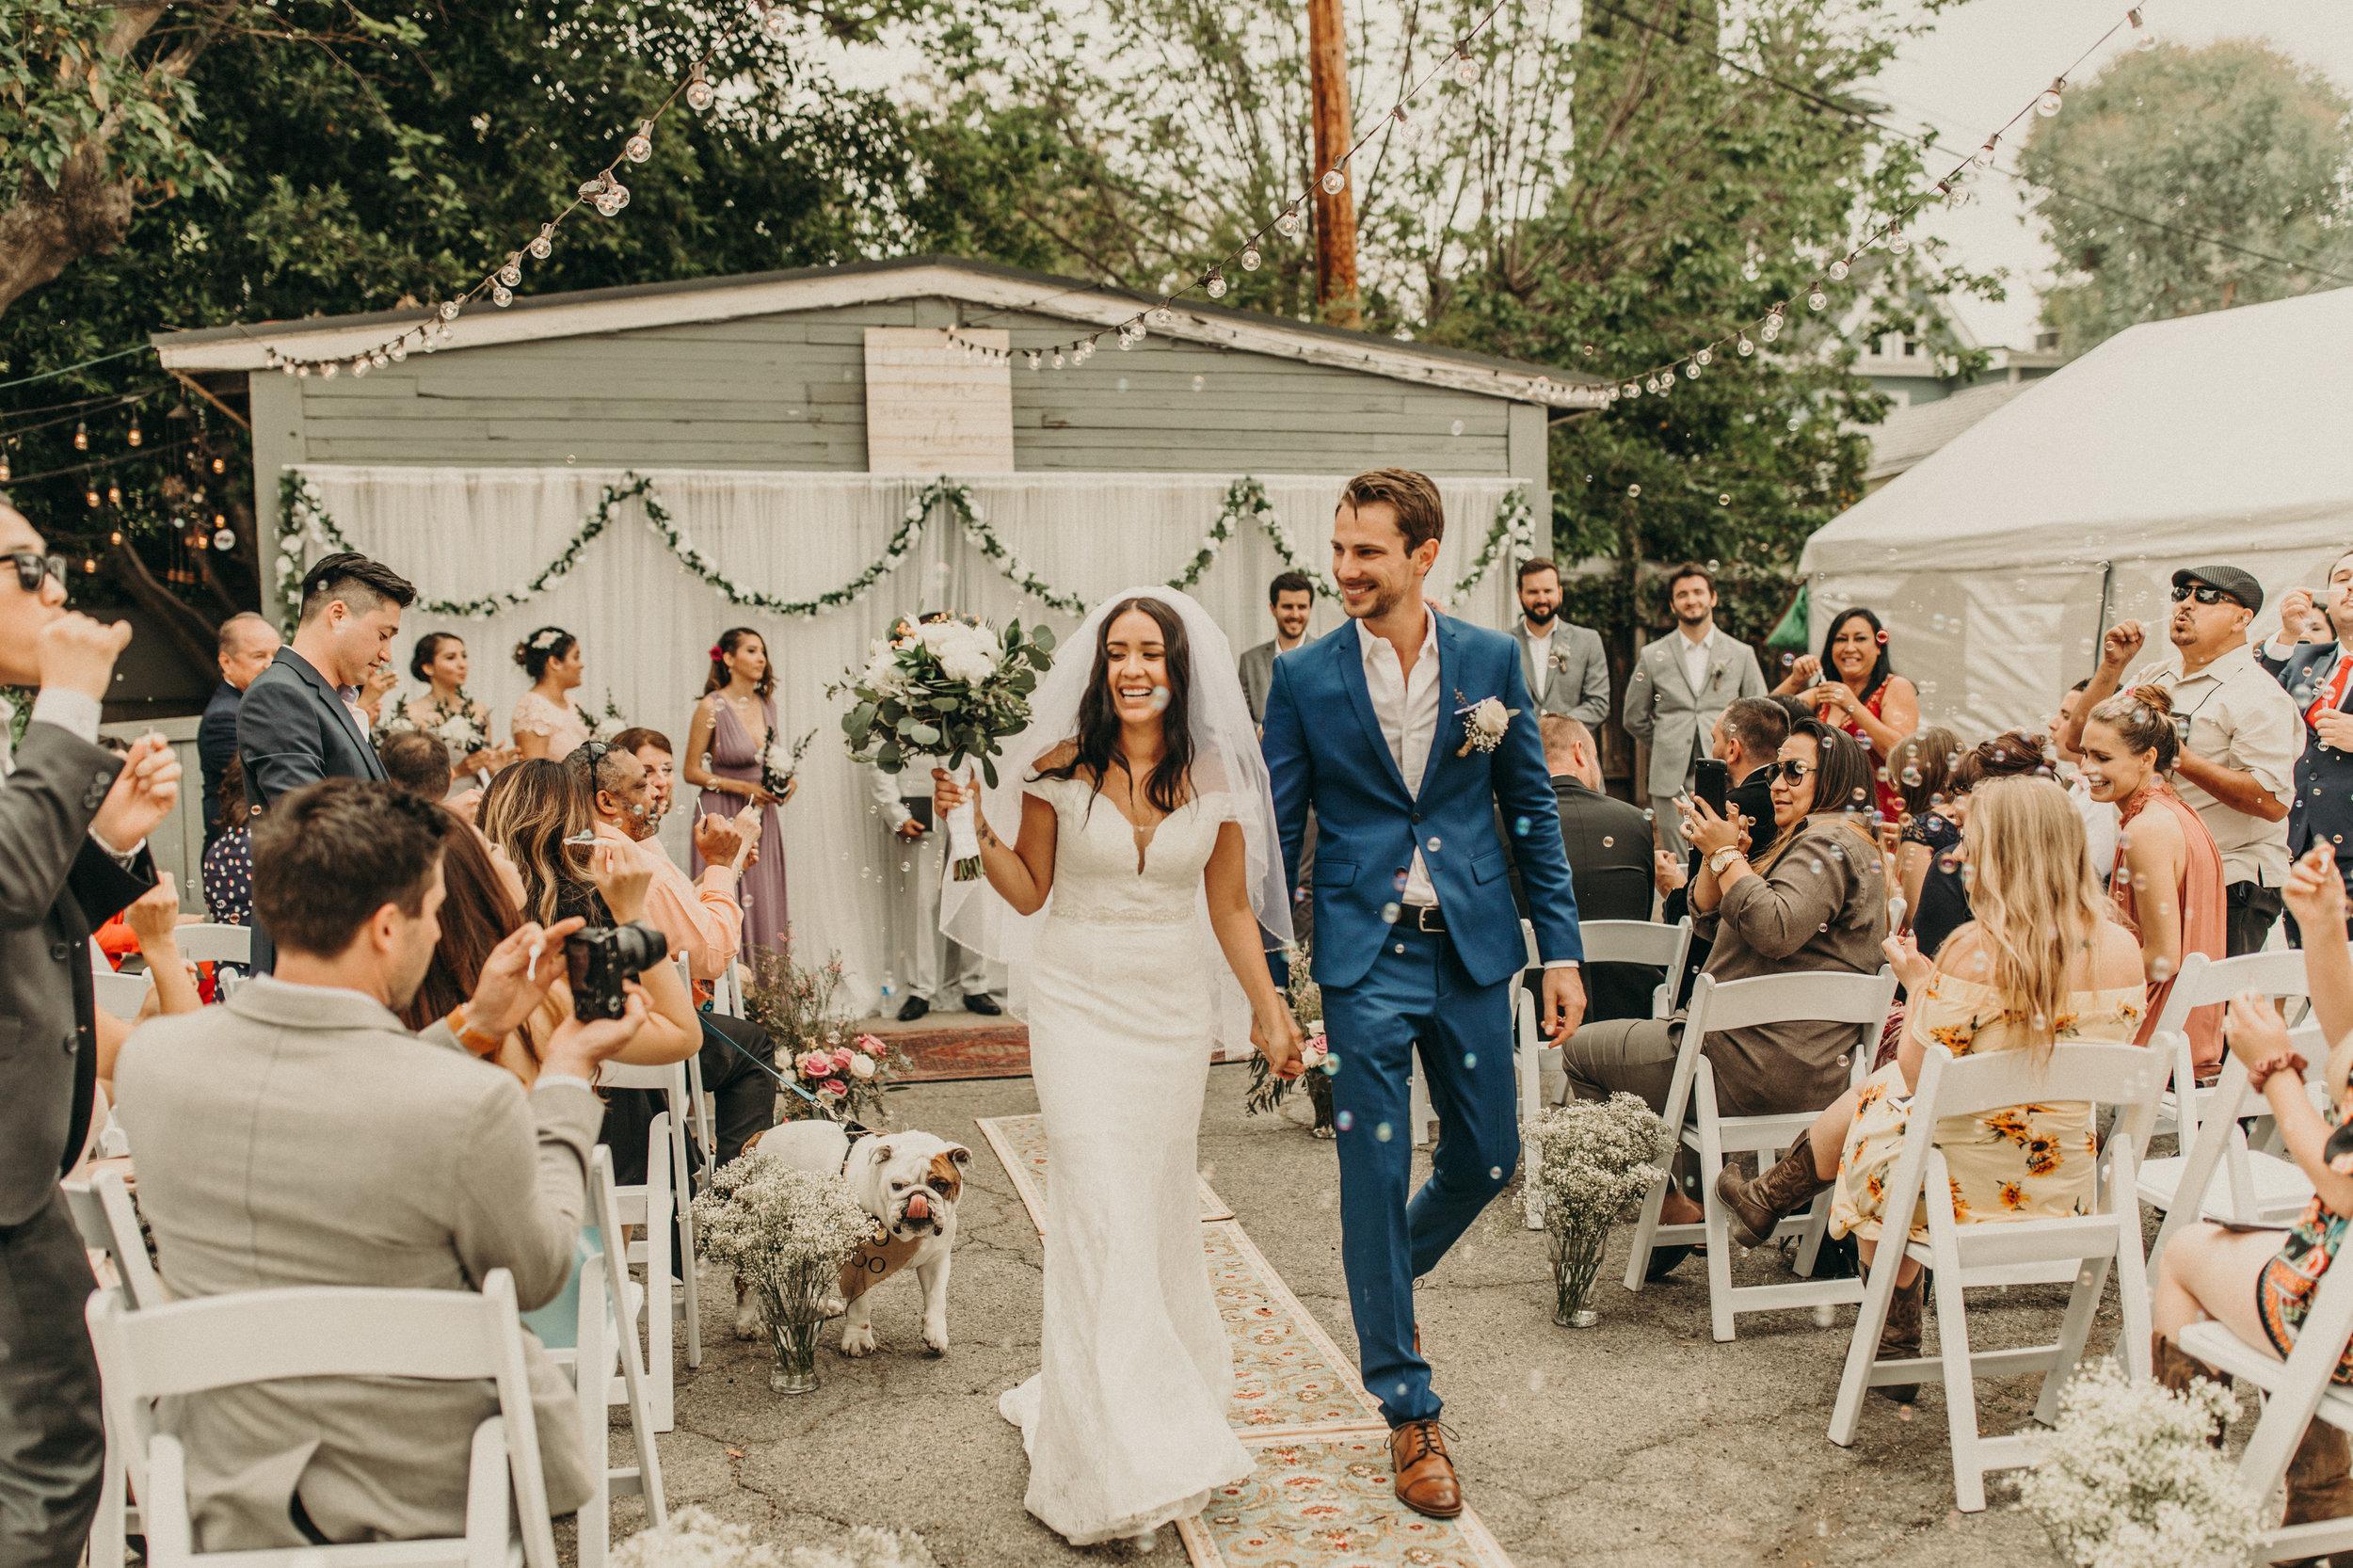 SAM + PAUL - Intimate Backyard Wedding in Pasadena, CA